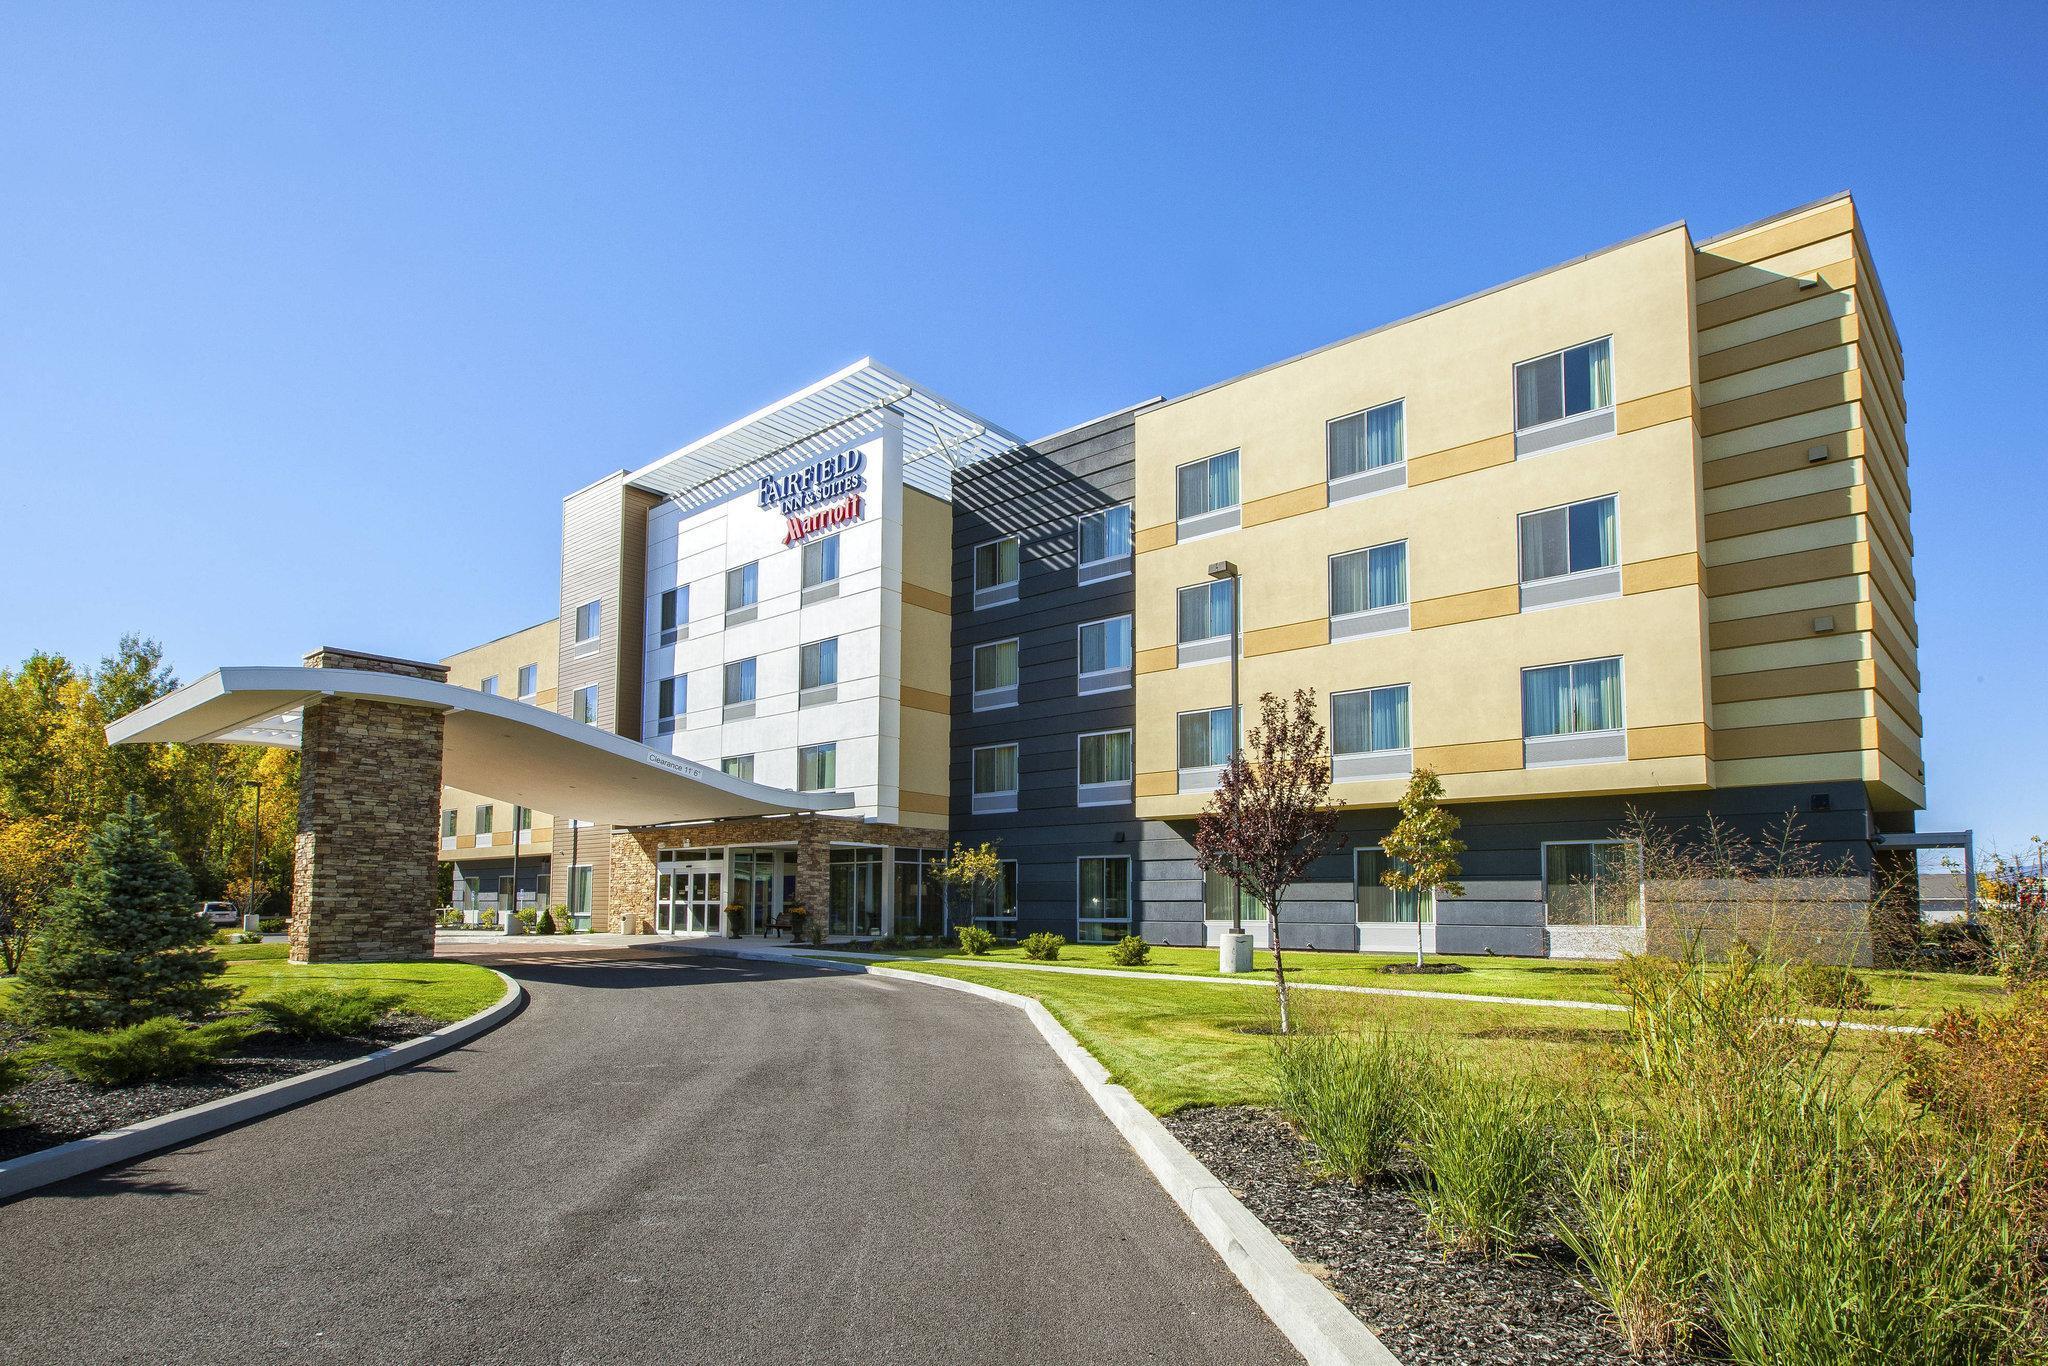 Fairfield Inn And Suites Plattsburgh